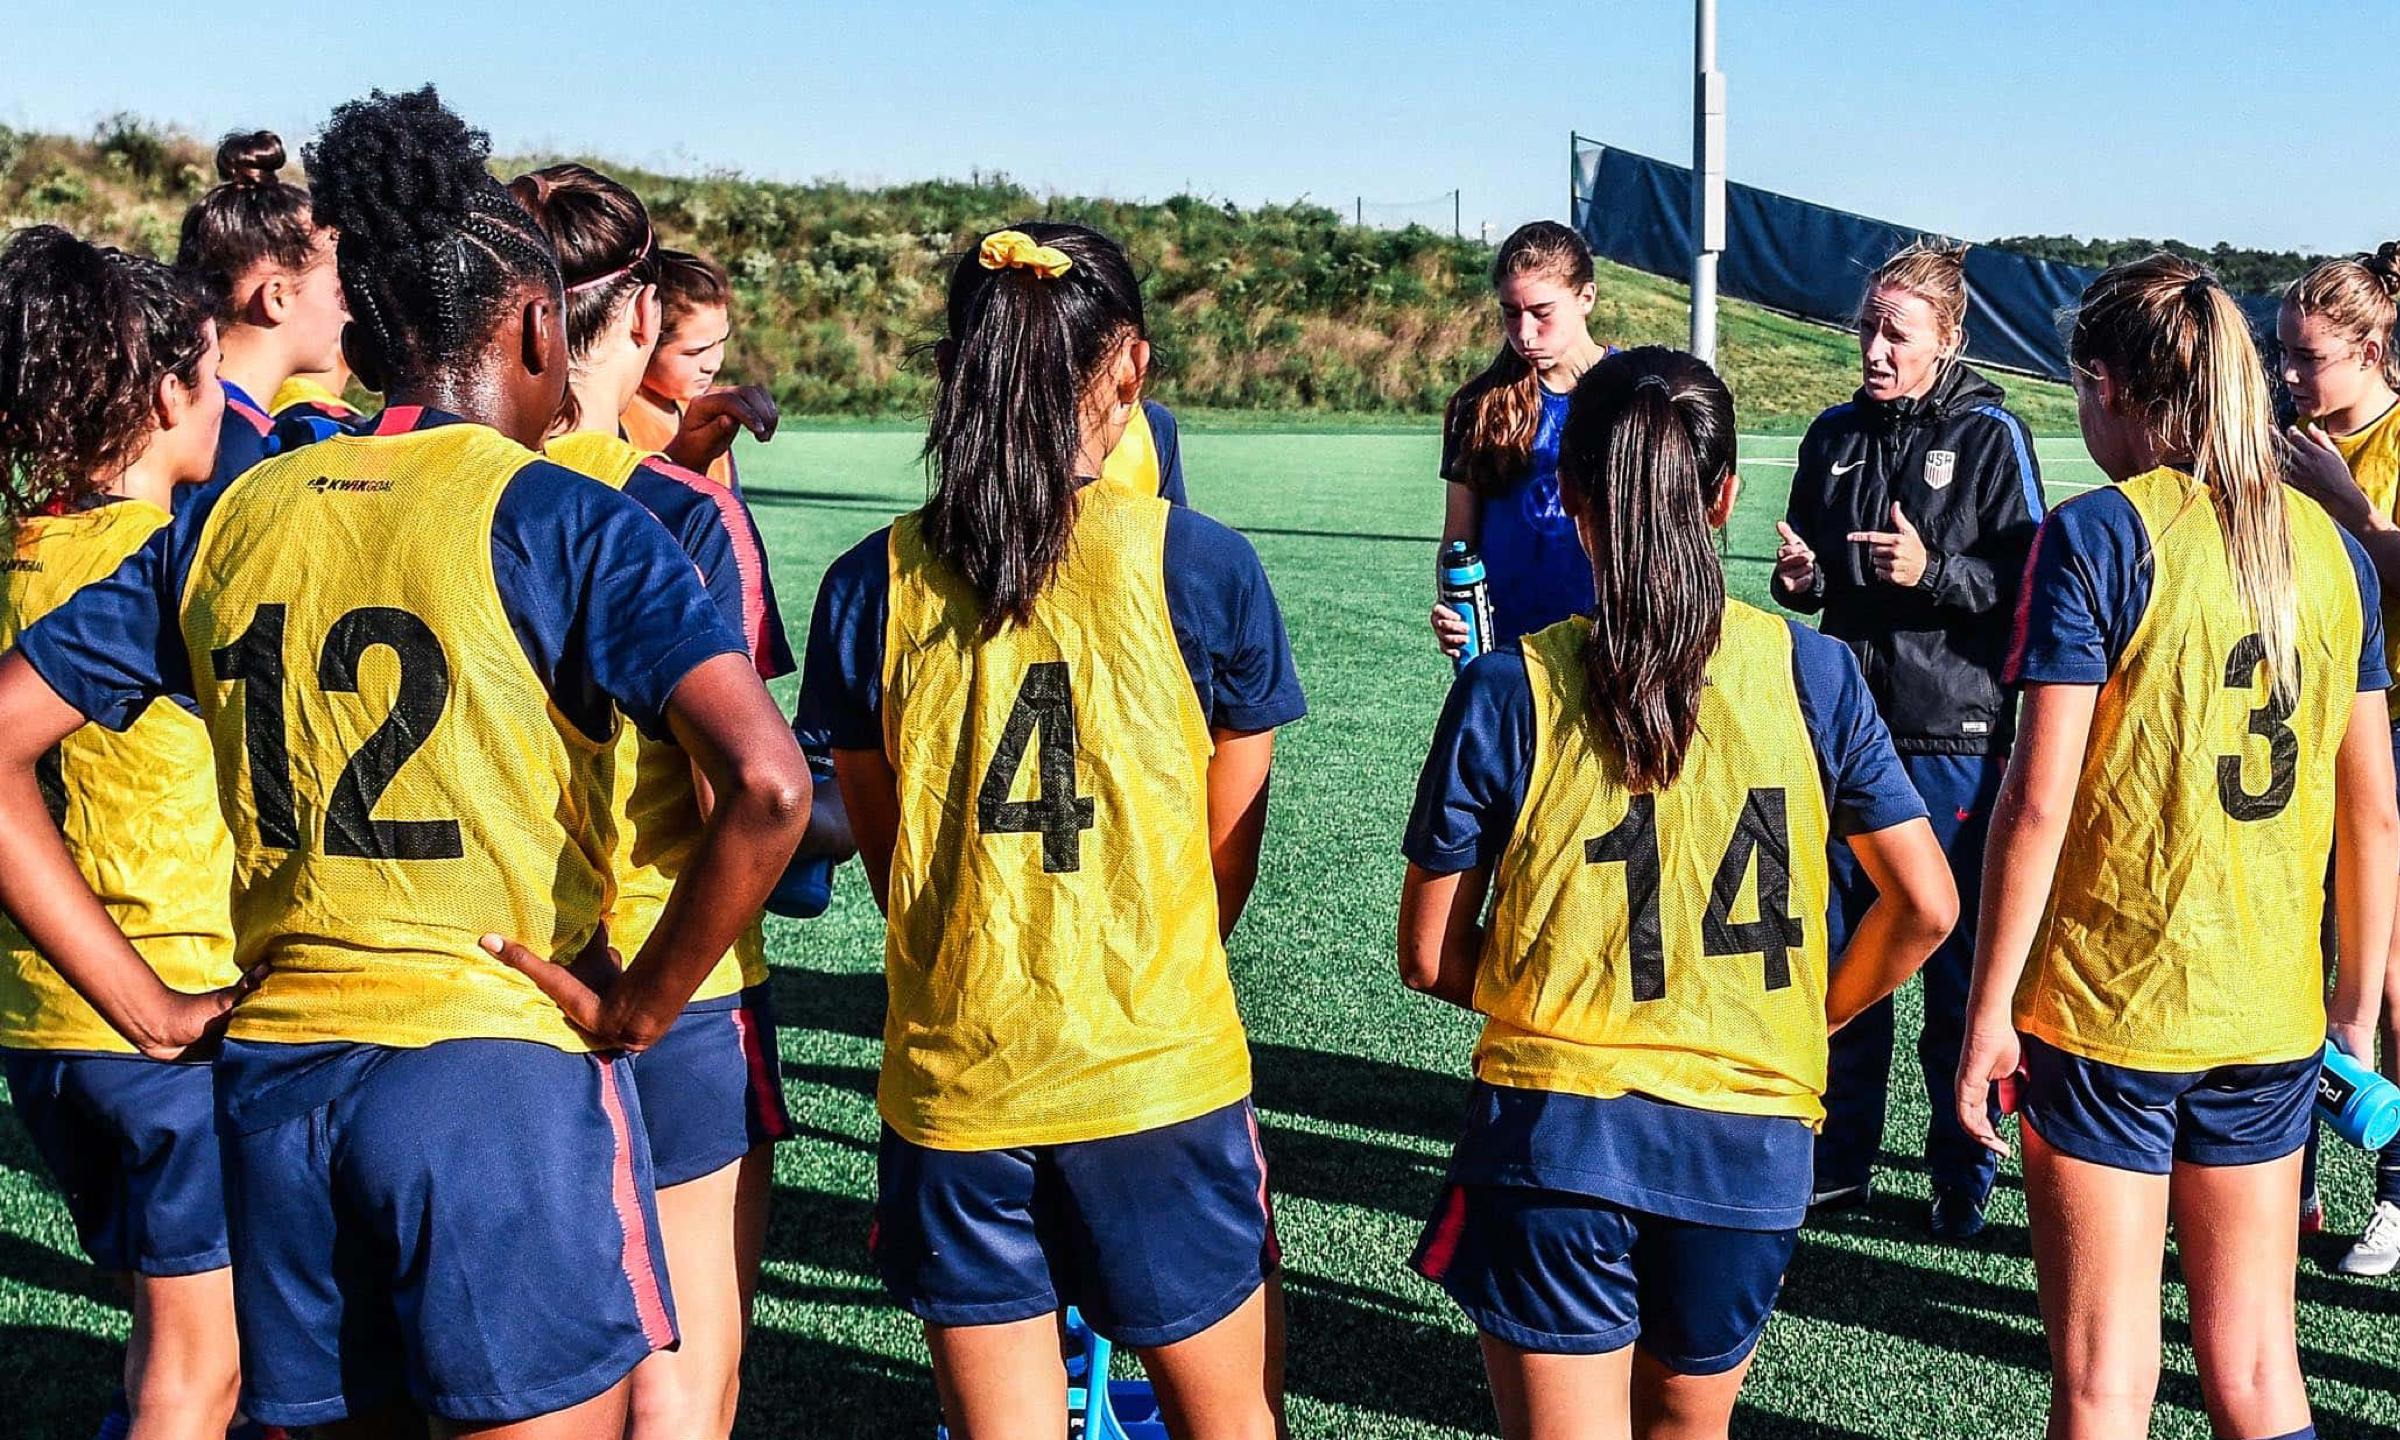 U-15 GIRLS' NATIONAL TEAM